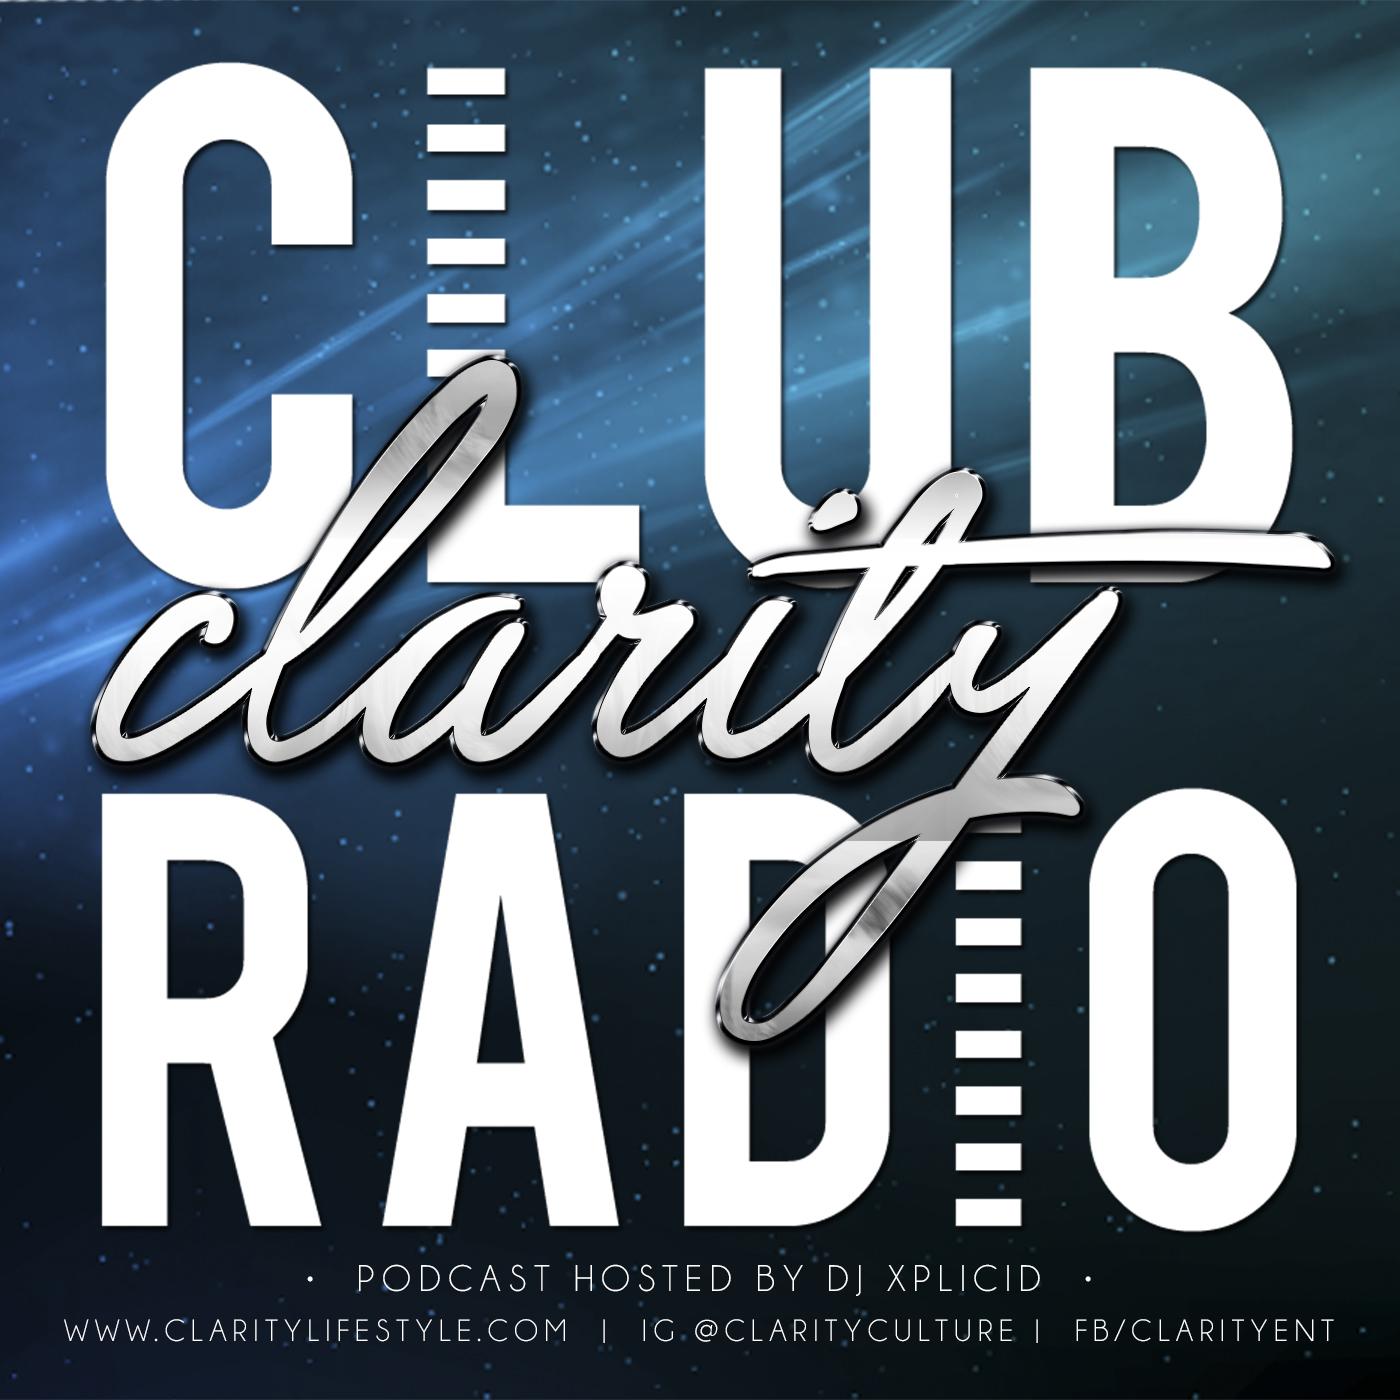 Club Clarity Radio Xplicid Nation By Dj Xplicid On Apple Podcasts